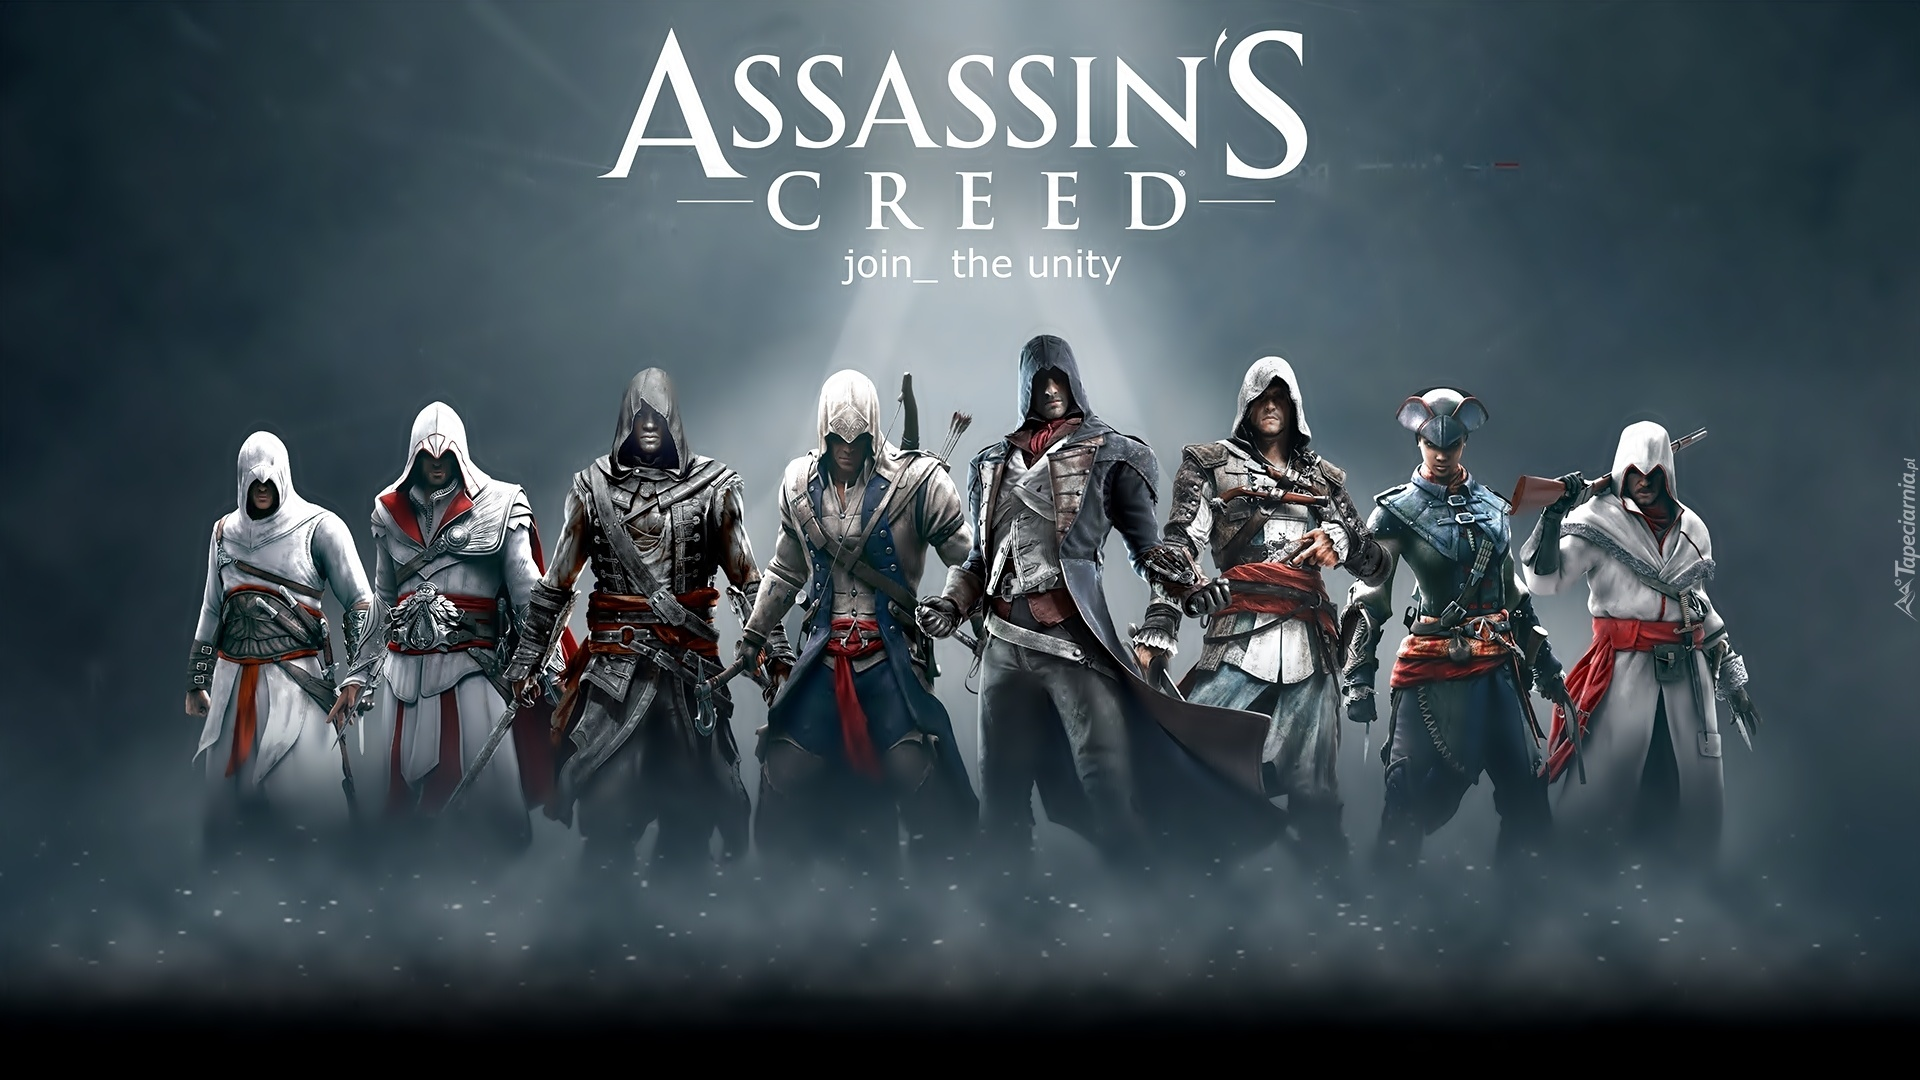 Assassins Creed, Unity: tapeciarnia.pl/230189_assassins_creed_unity.html